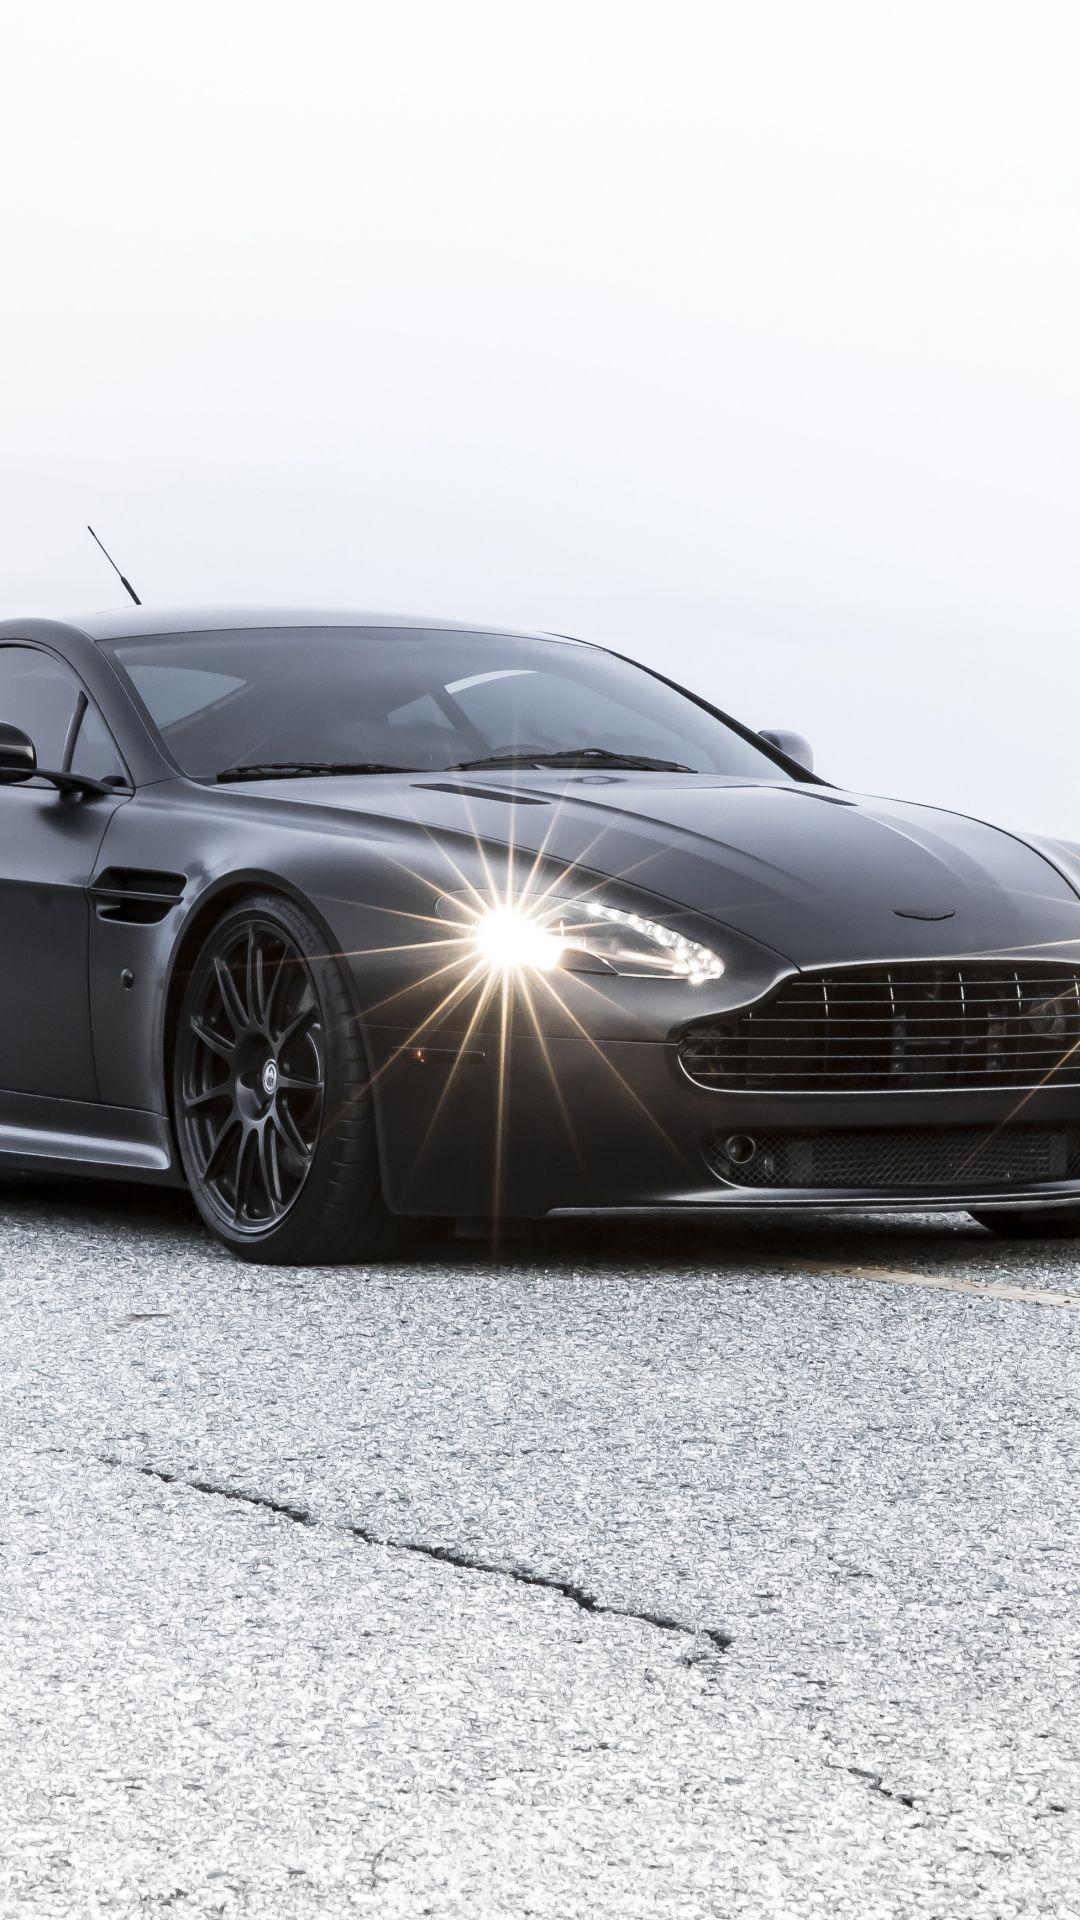 Aston Martin Vantage Black Bump Iphone 6 Plus Wallpaper Iphone